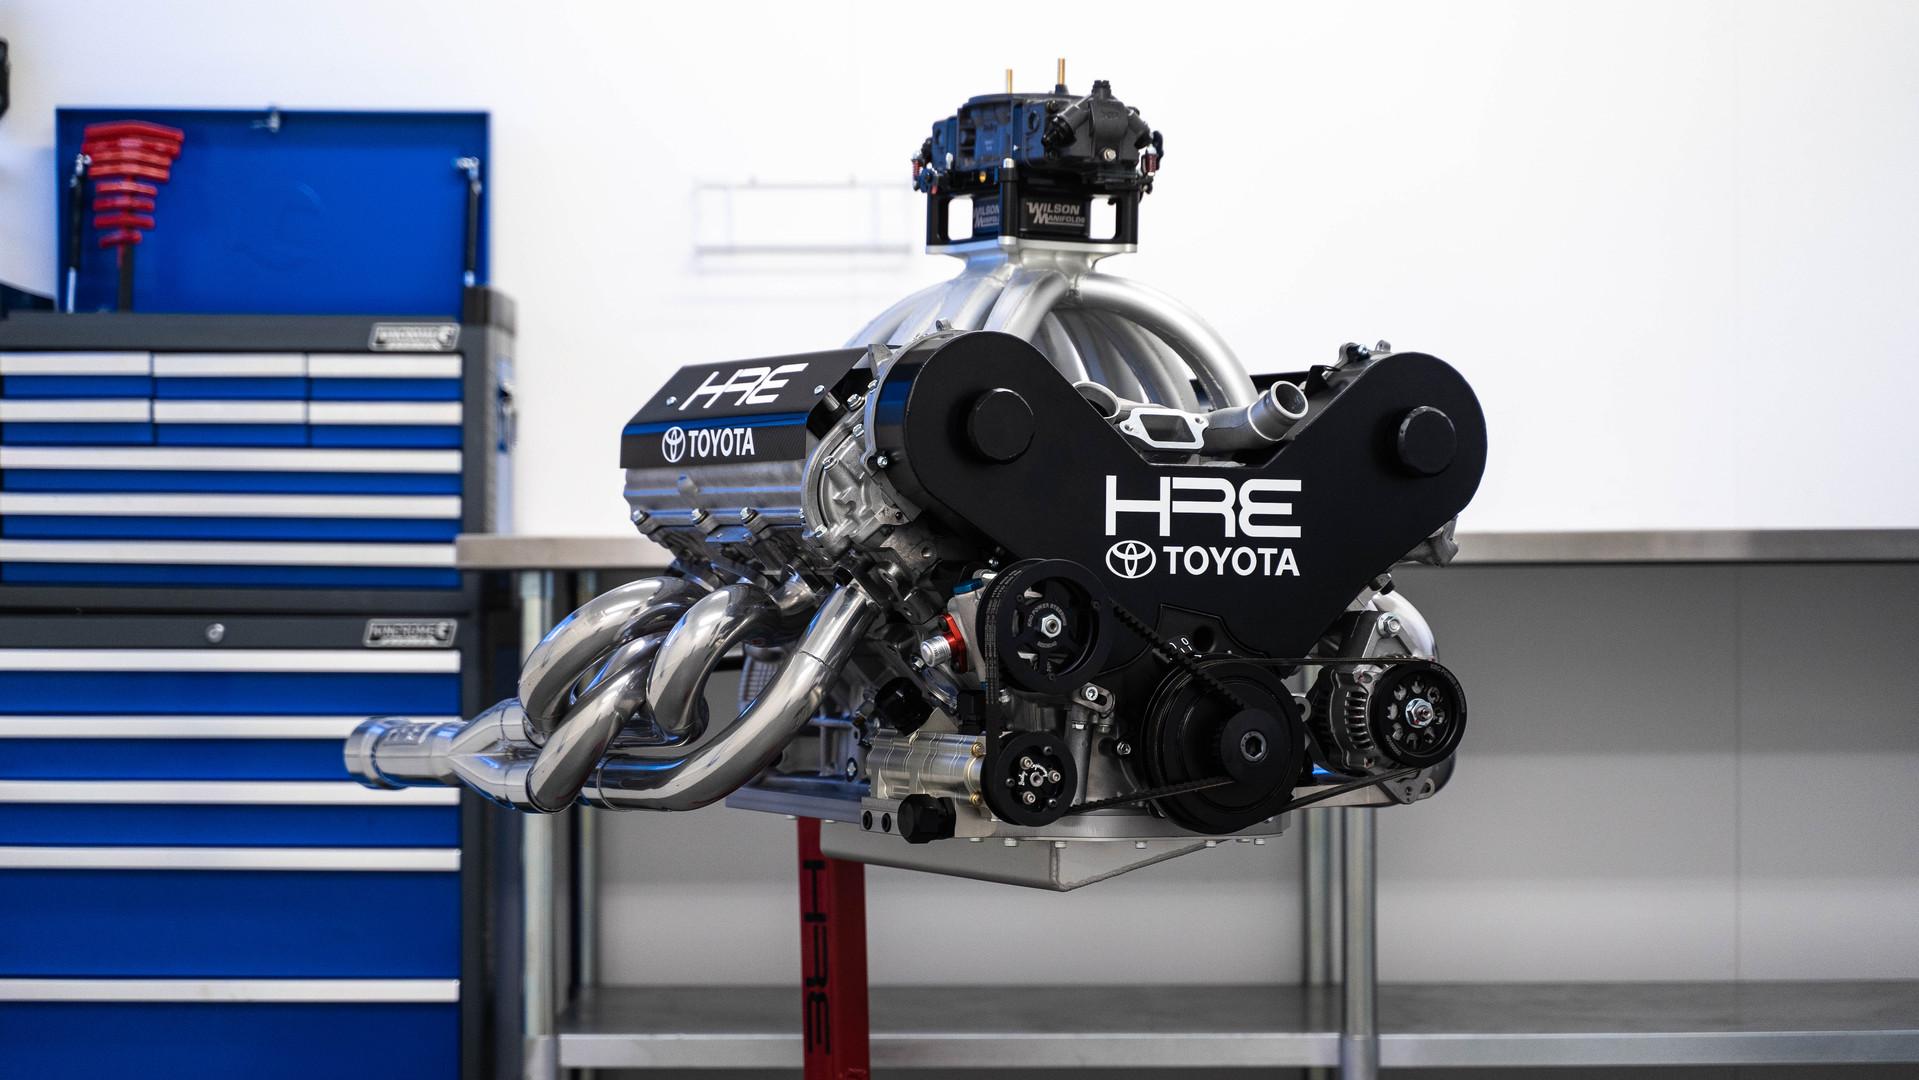 V8 builds